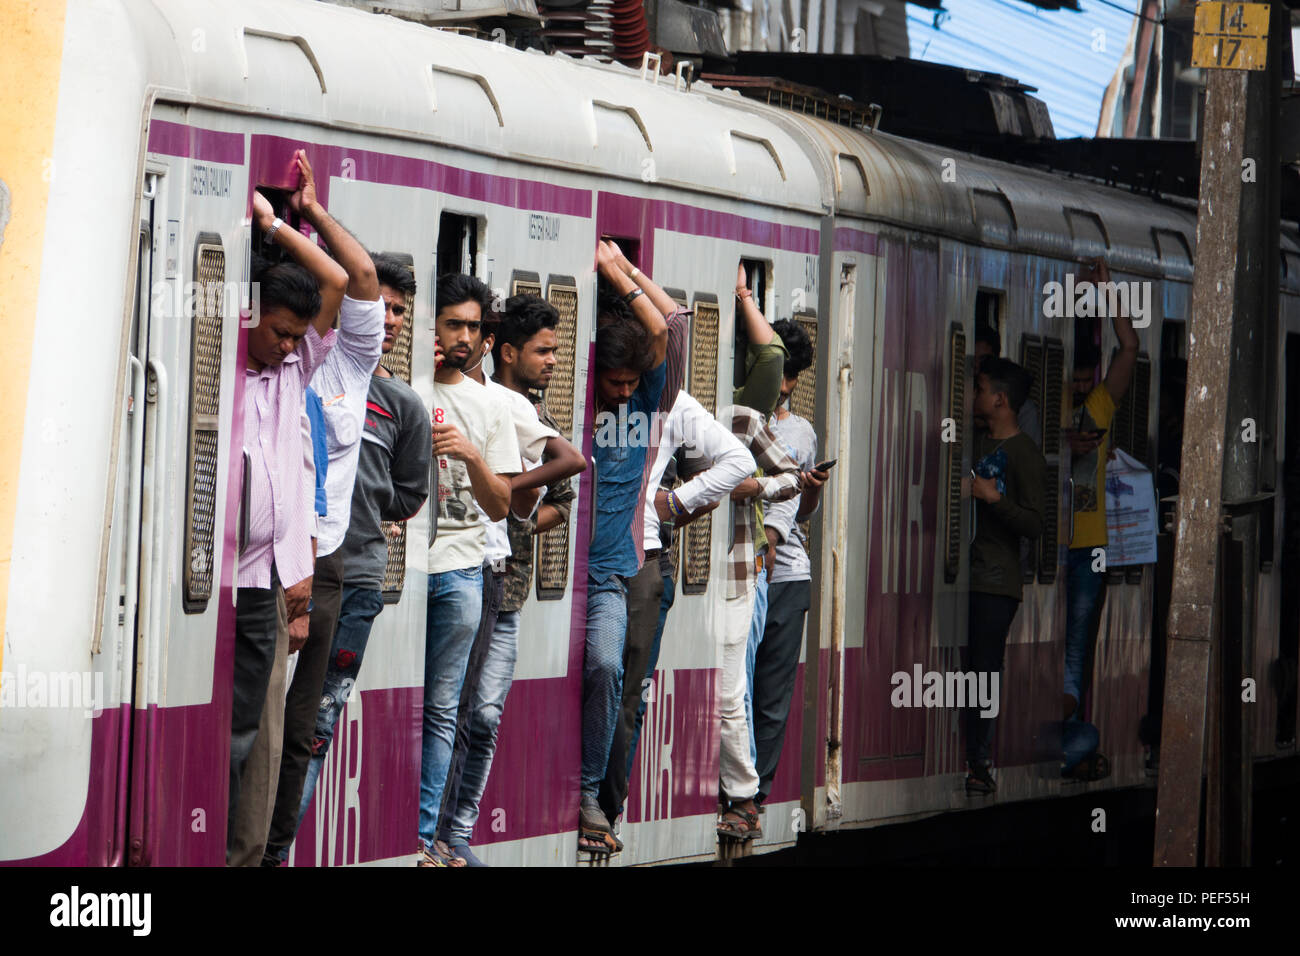 Passengers hanging out of trains door on a Mumbai Suburban Railway train at Bandra station in Mumbai, India - Stock Image